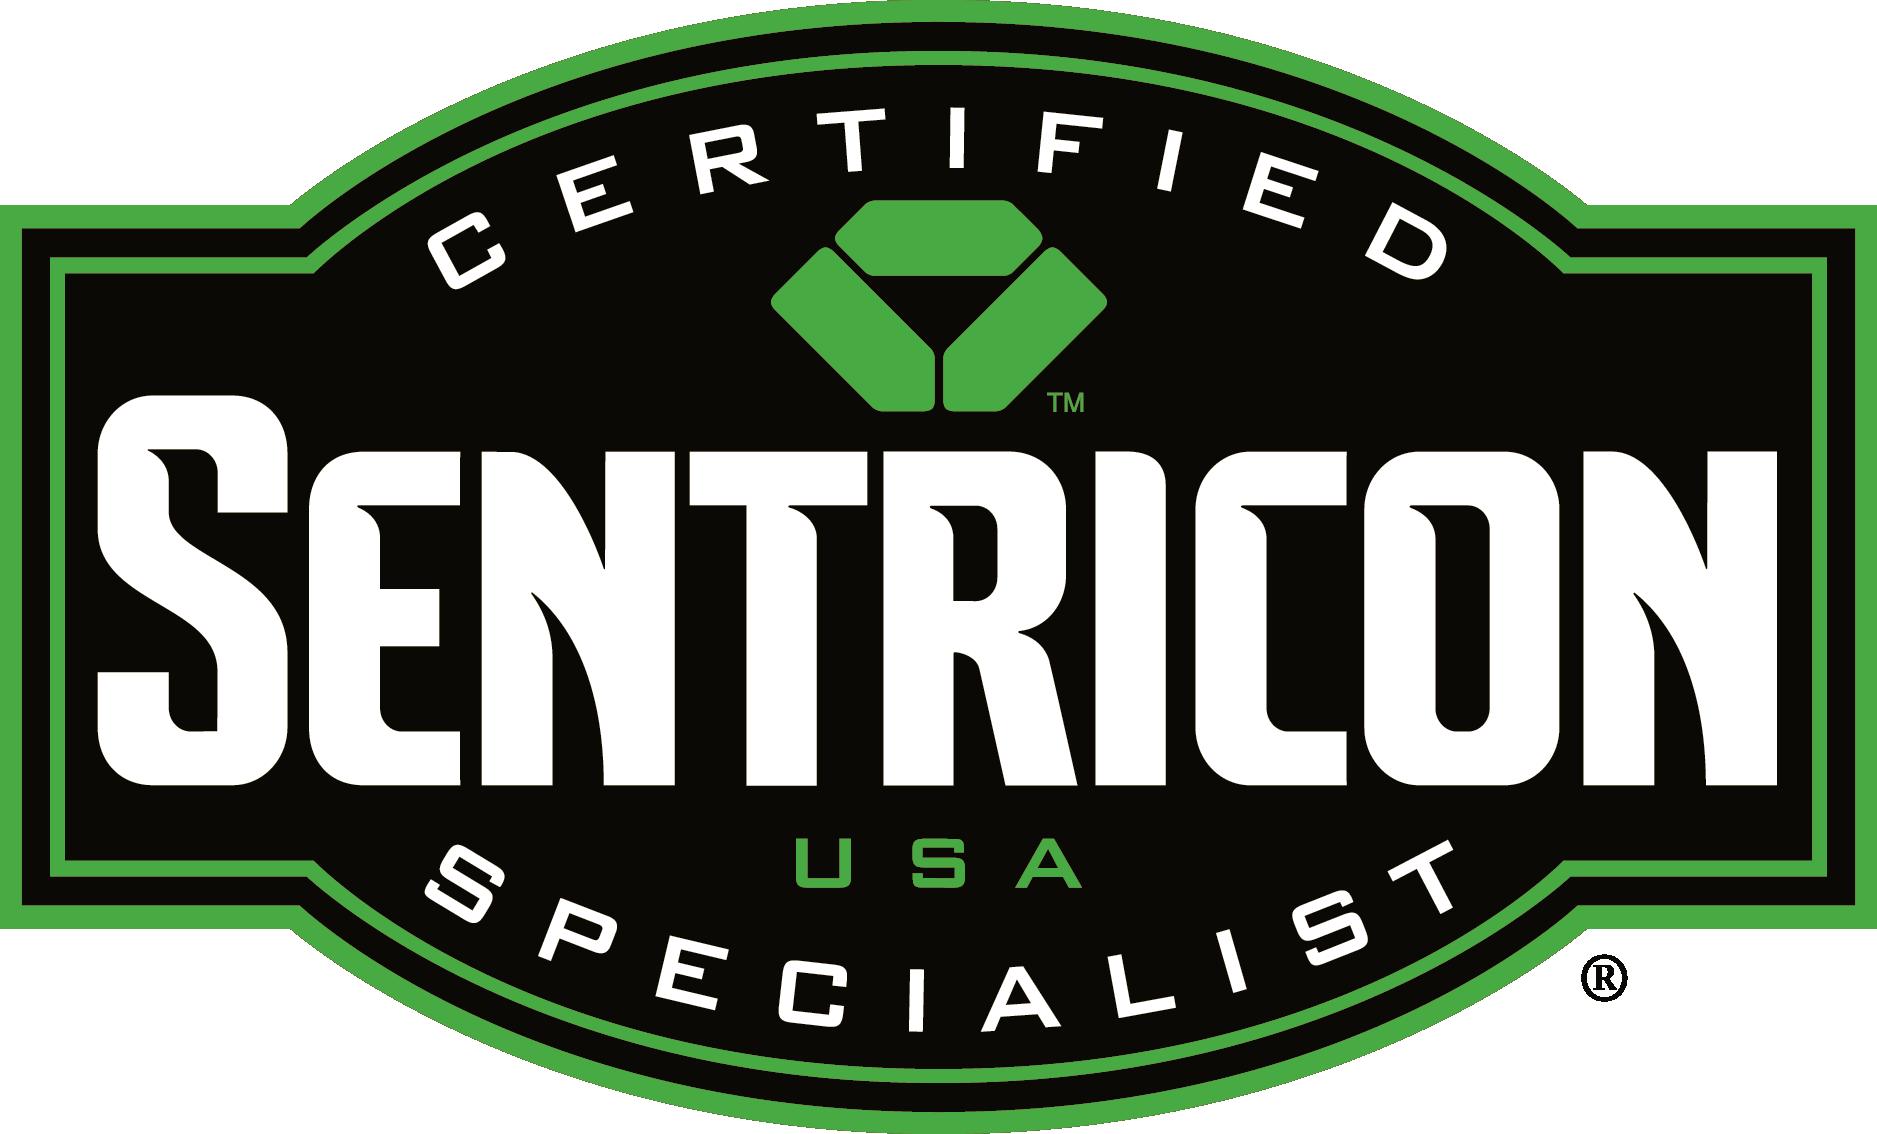 Sentricon Certified Specialist Logo